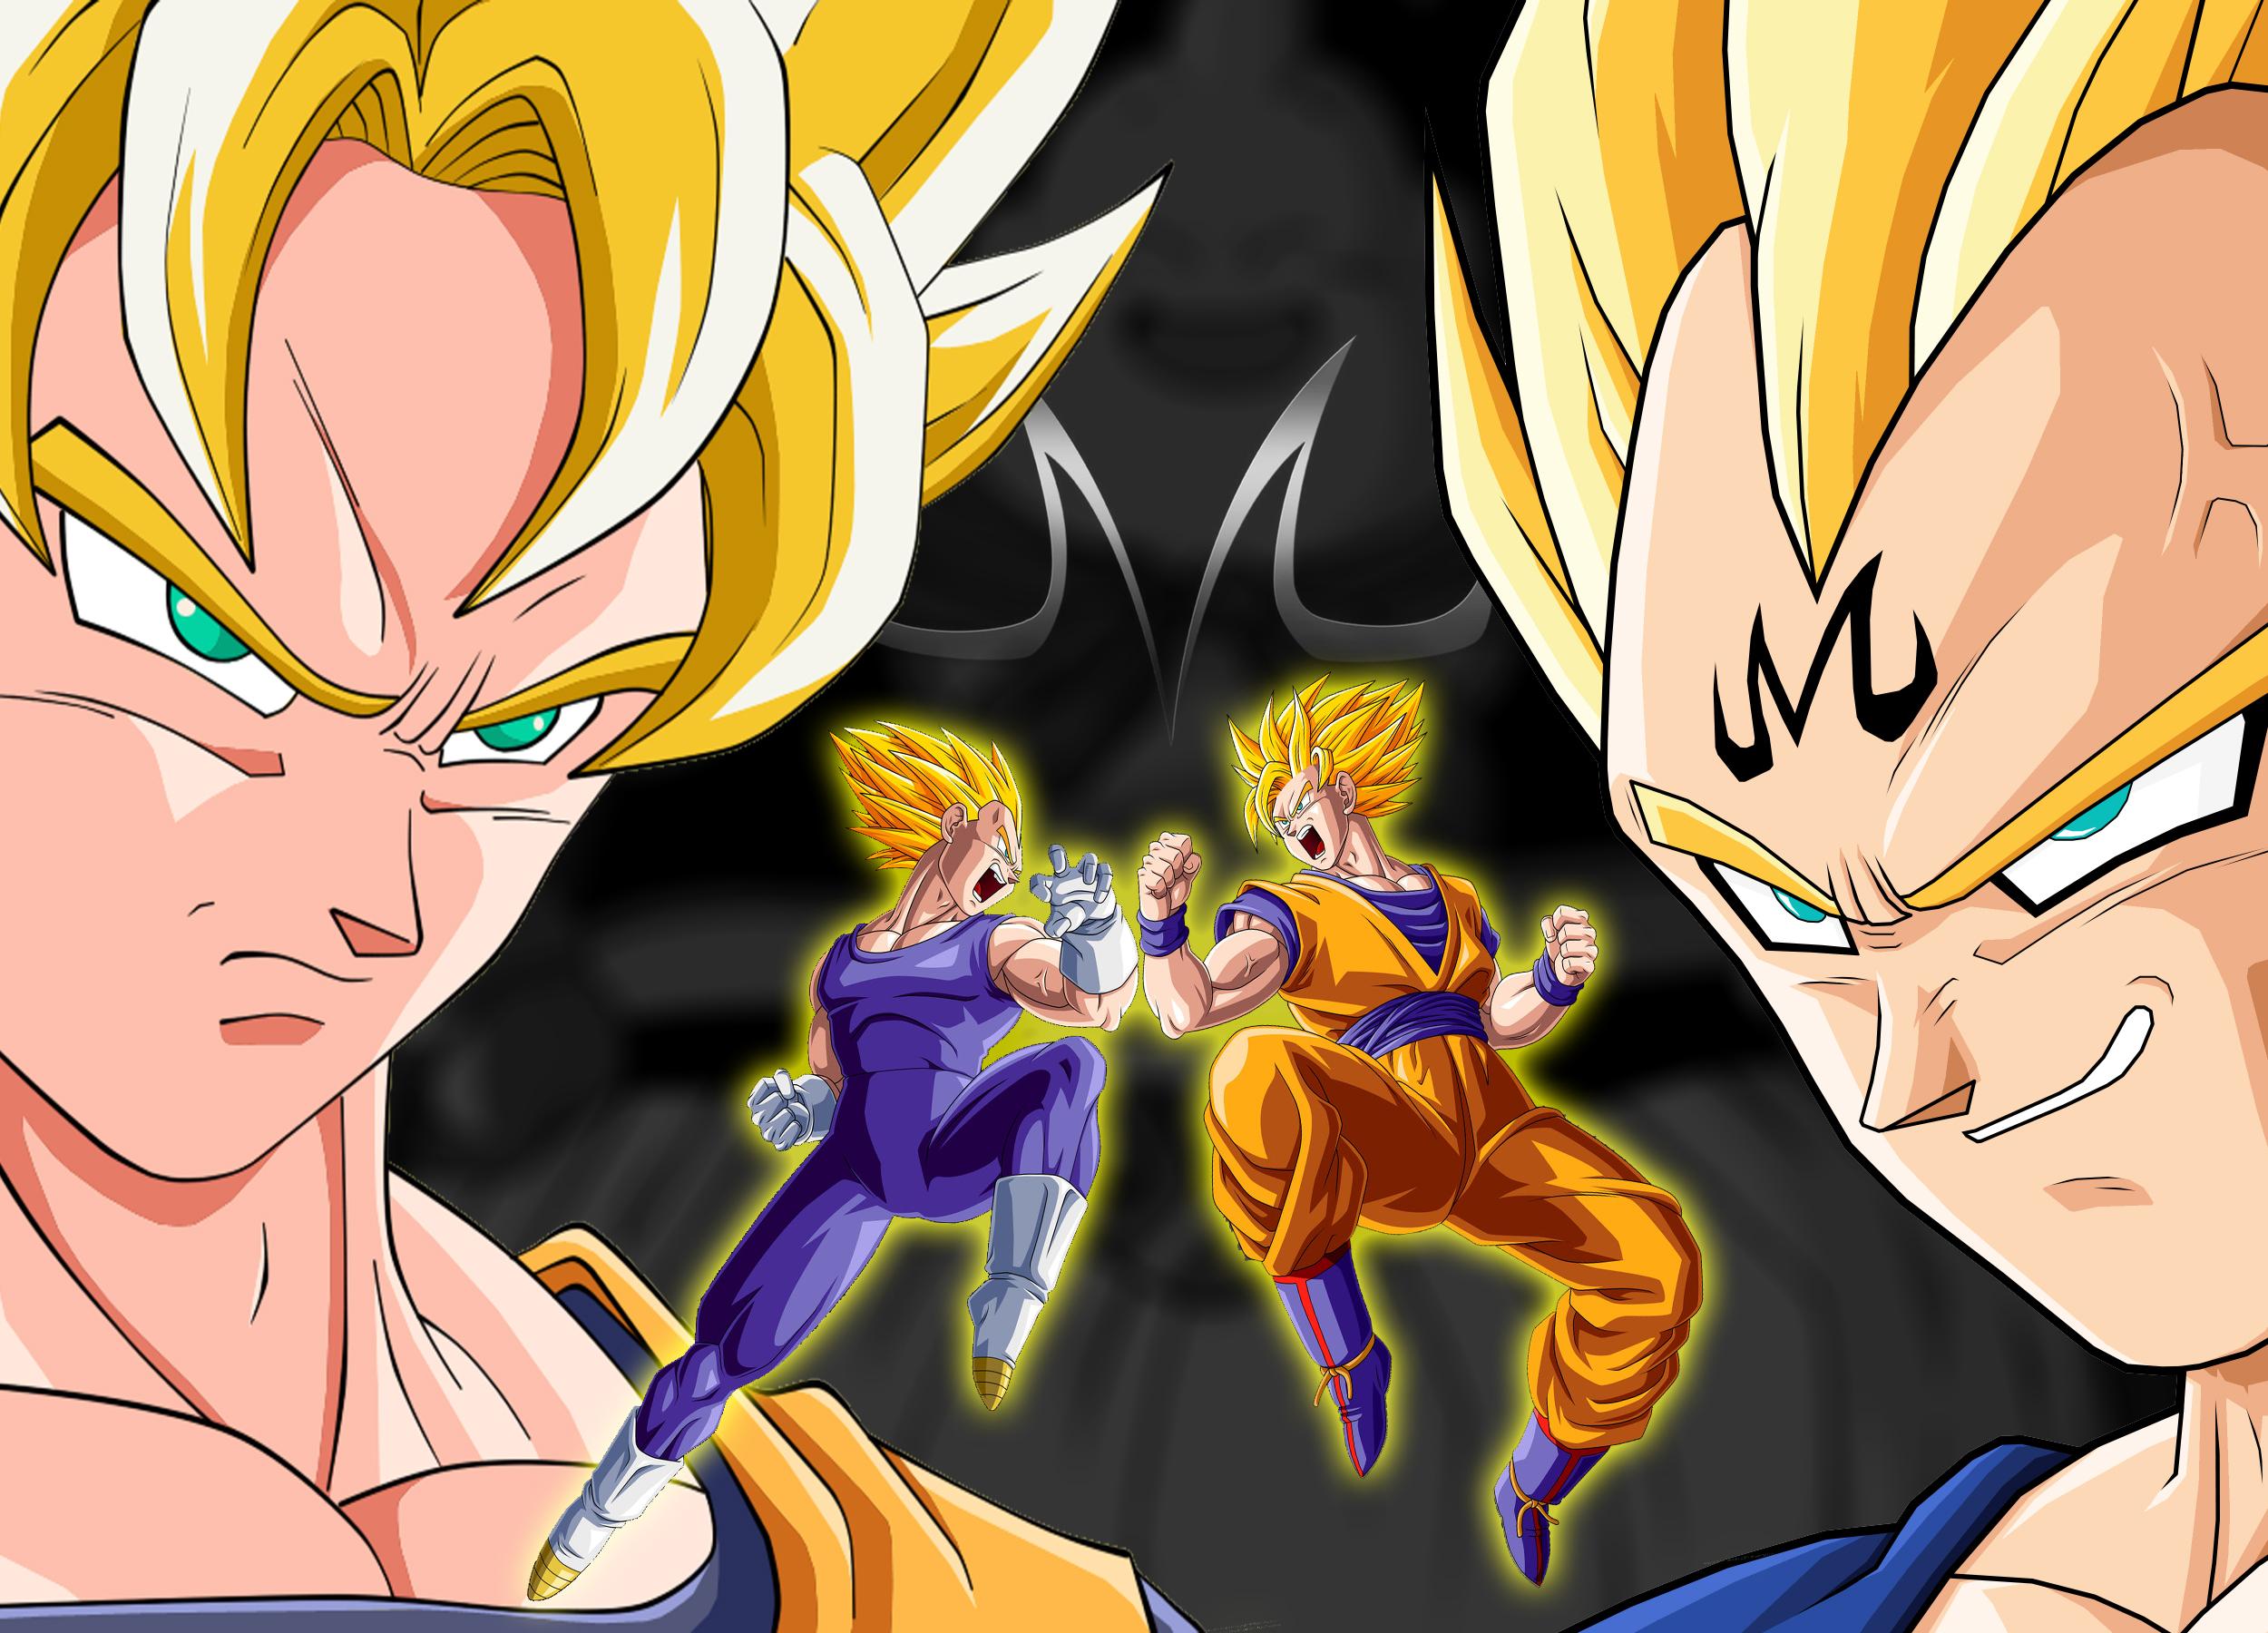 Goku Vs Vegeta fondo de pantalla   ForWallpapercom 2500x1800